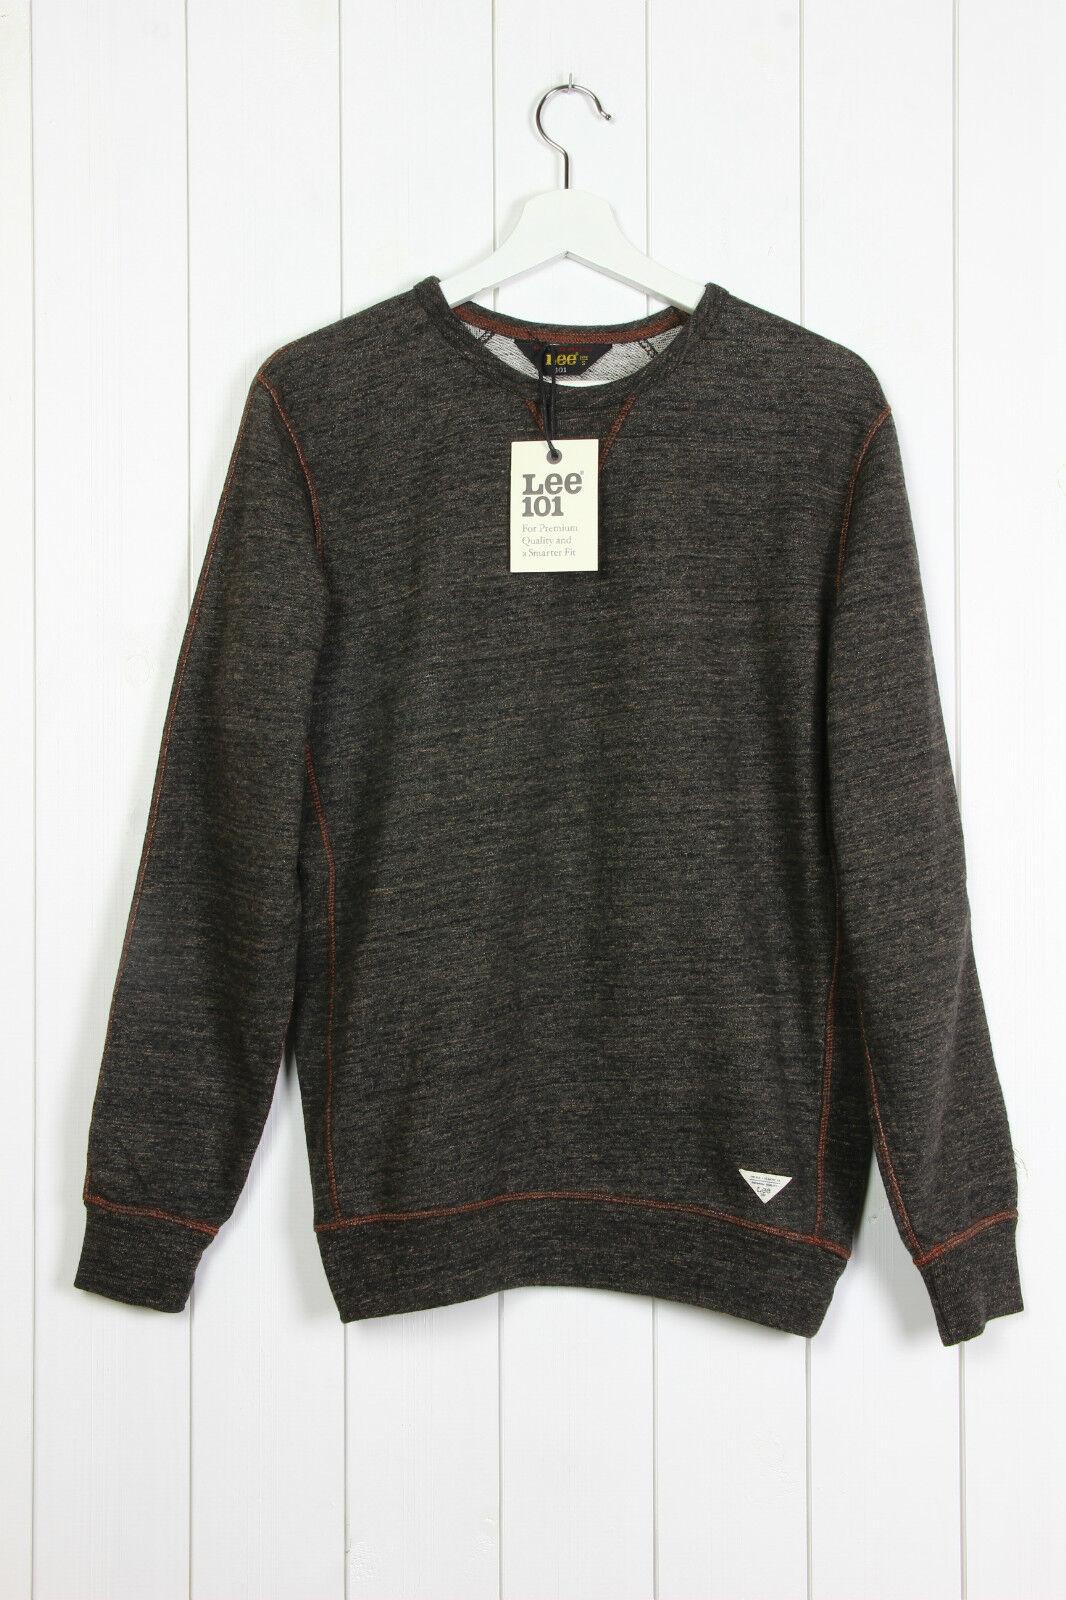 NEU Lee 101 Premium Rundhals Sweatshirt Pulli Langarm braun / M/L/XL/XXL